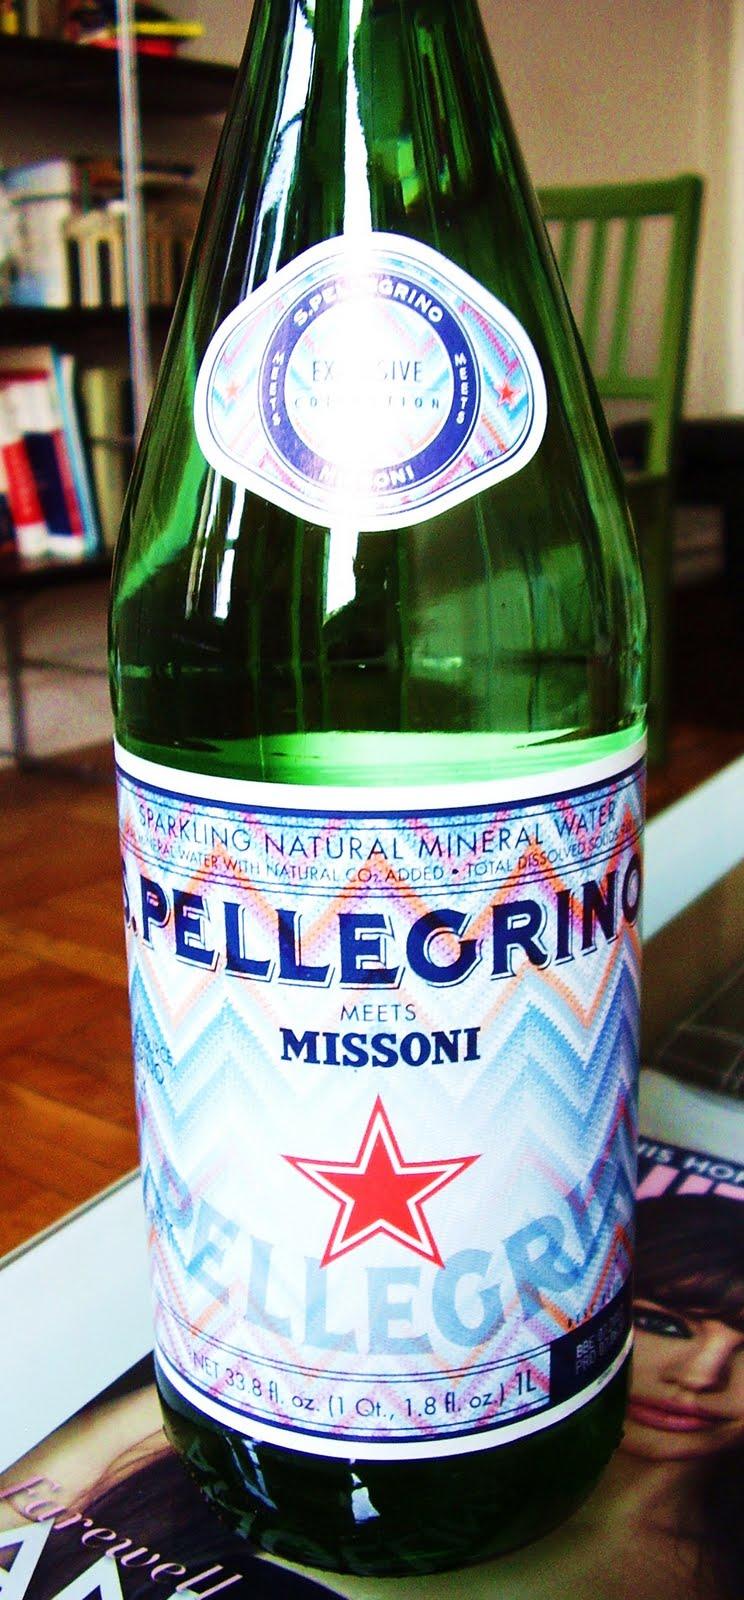 Striped-missoni-san-pellegrino-bottle